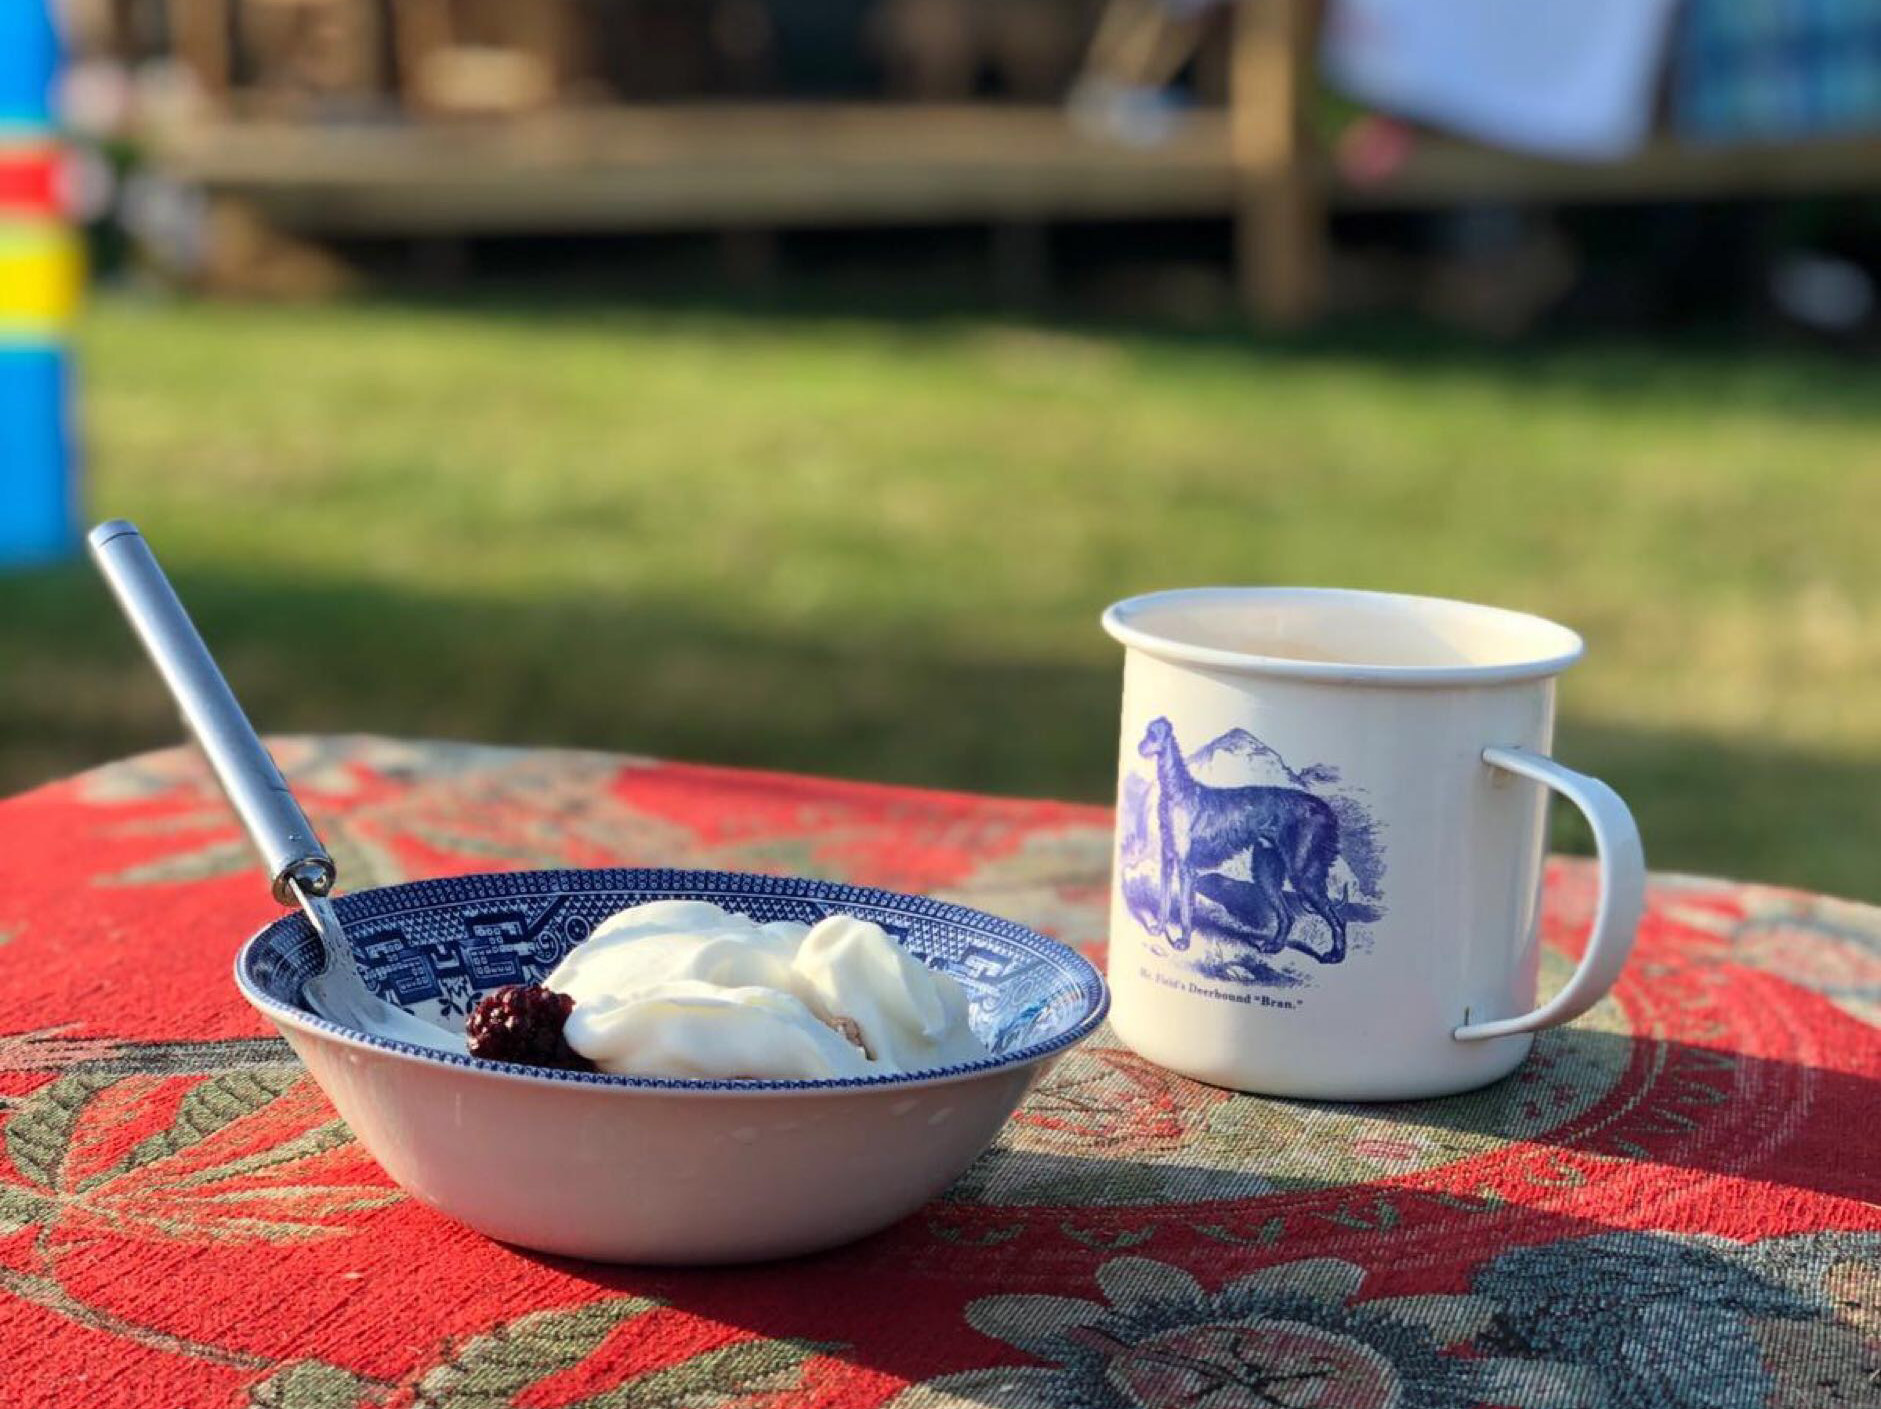 Tea and breakfast in the sun